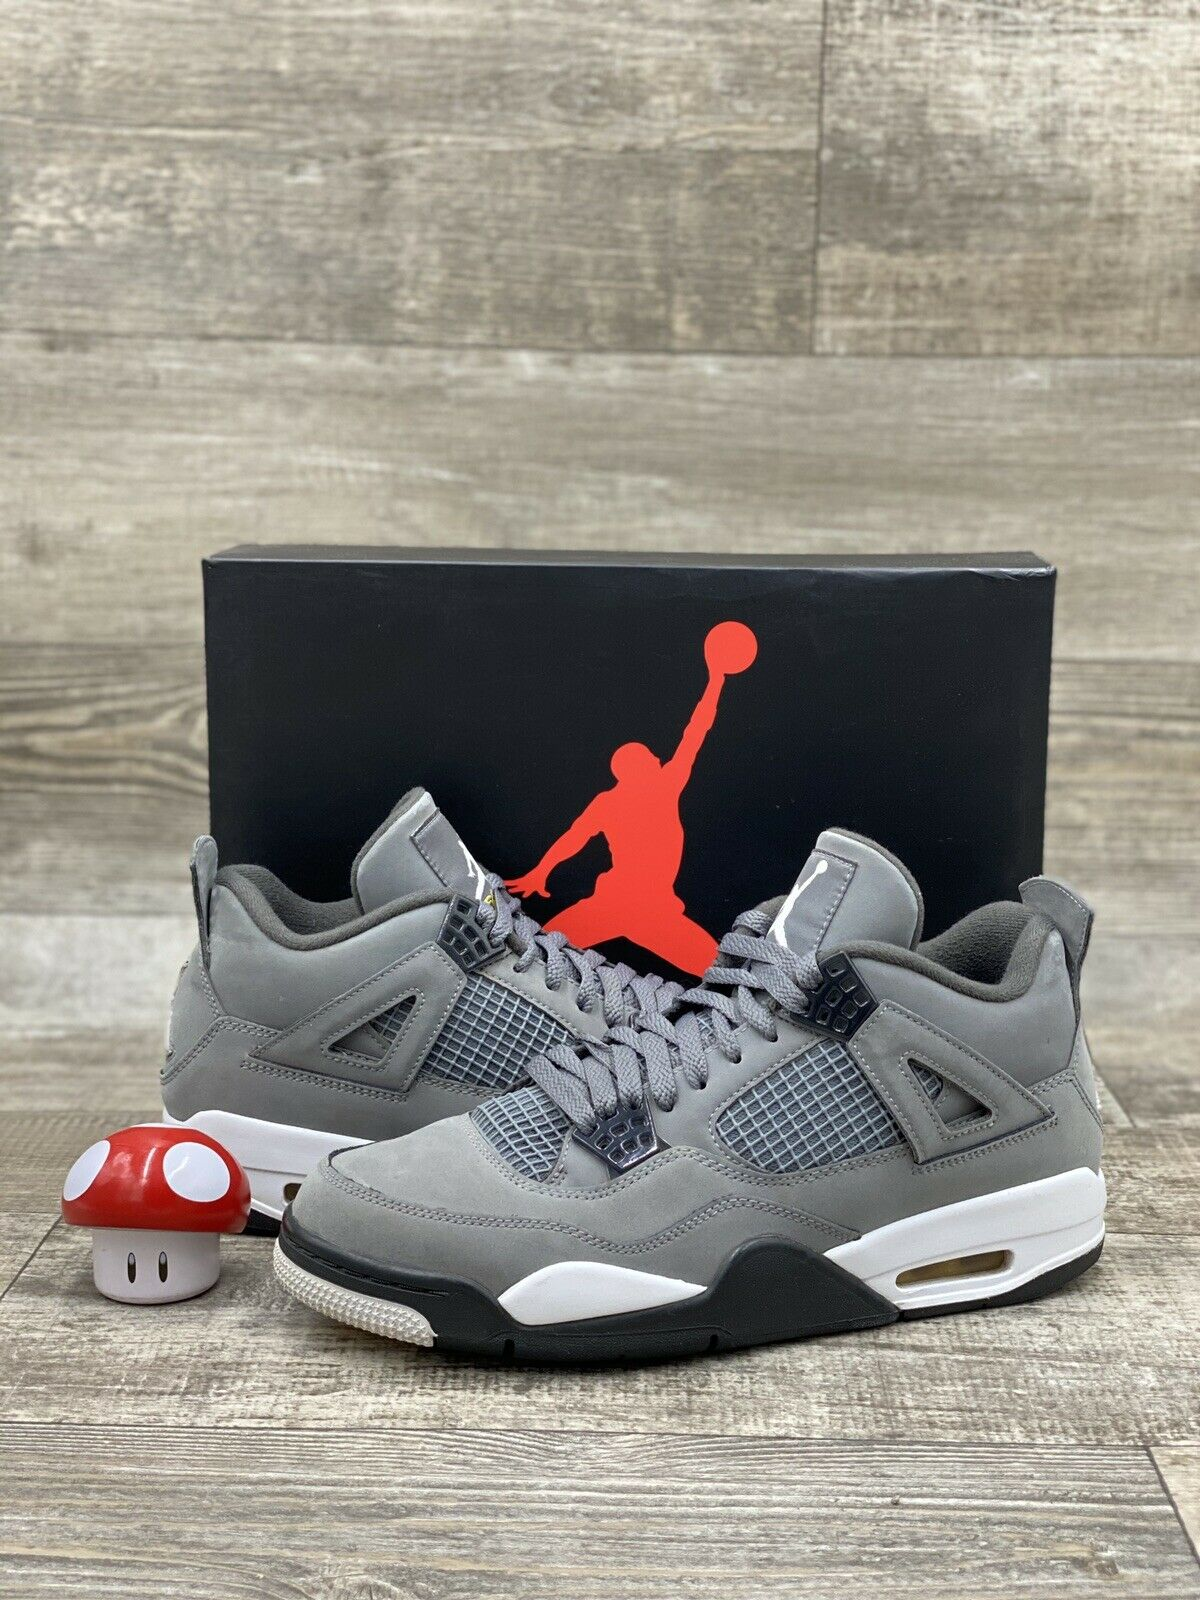 Jordan 4 Retro Cool Grey 2019